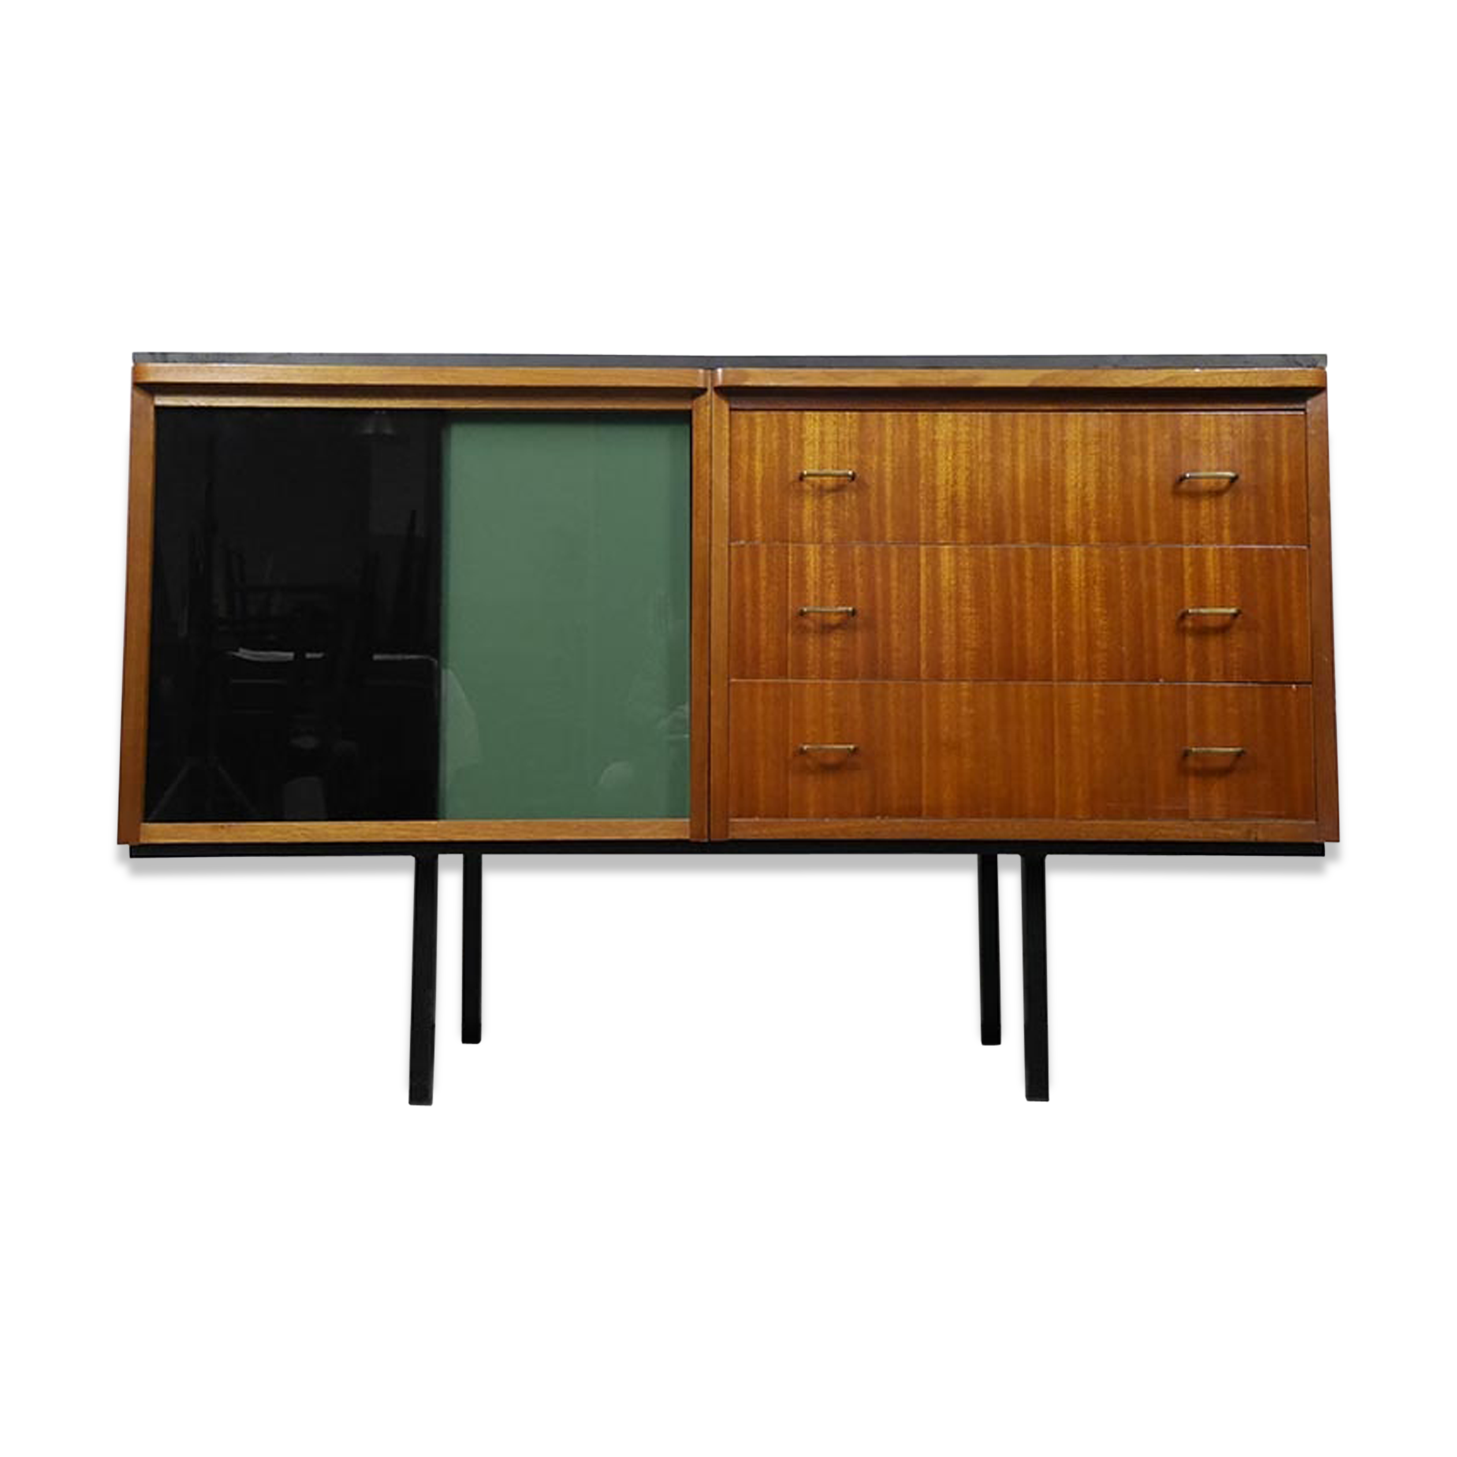 enfilade scandinave pas cher buffet vintage pas cher with enfilade scandinave pas cher. Black Bedroom Furniture Sets. Home Design Ideas